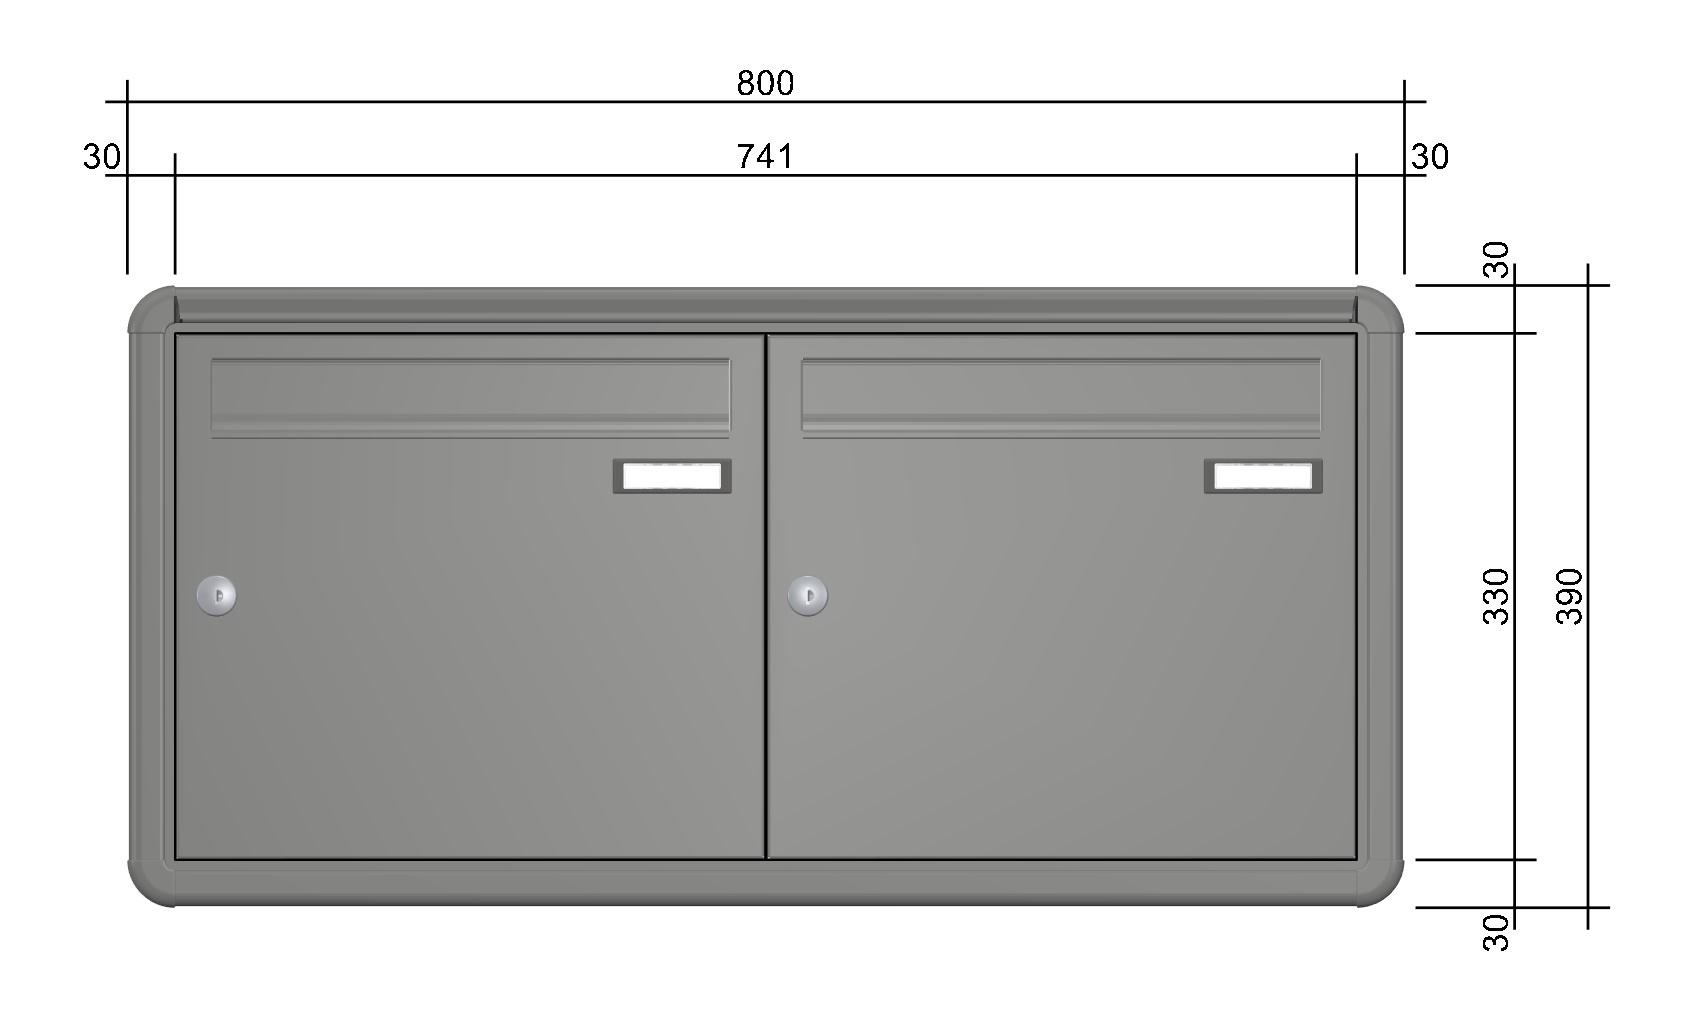 aph103 aufputz briefkastenanlage doppelbriefkasten 2 tlg tiefe 100 ri220 farbauswahl www. Black Bedroom Furniture Sets. Home Design Ideas